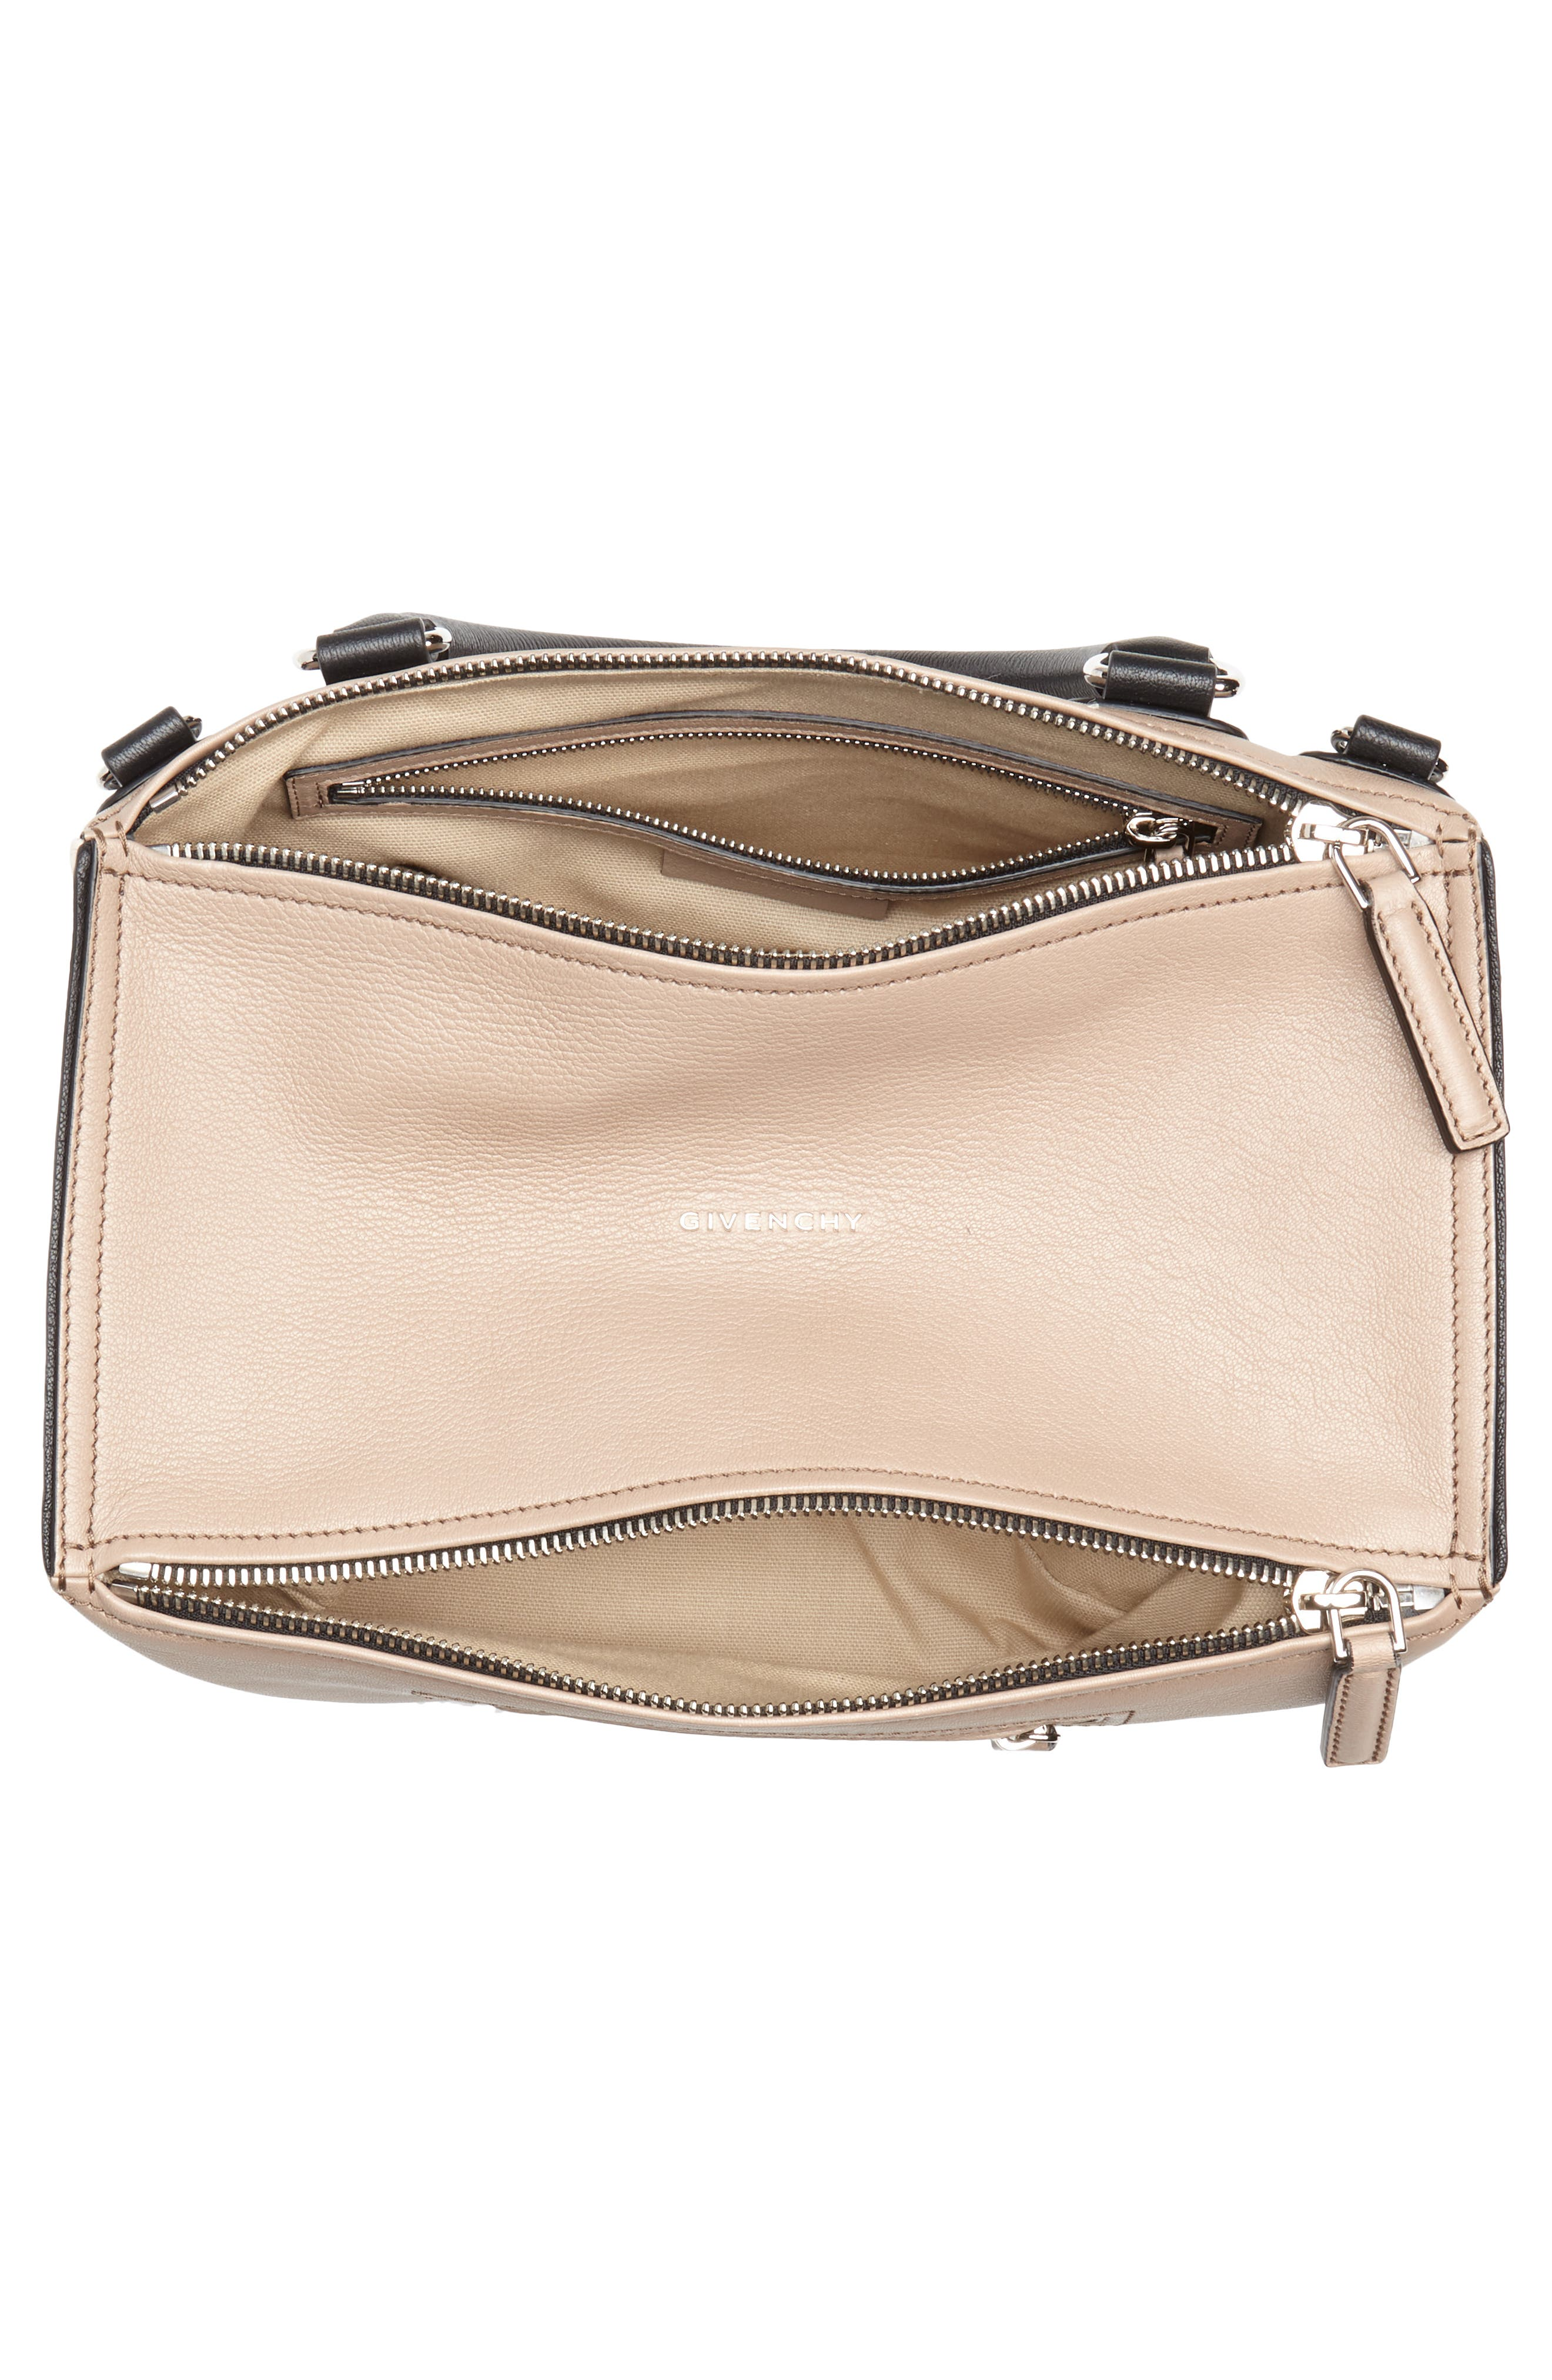 Medium Pandora Box Tricolor Leather Crossbody Bag,                             Alternate thumbnail 4, color,                             Linen